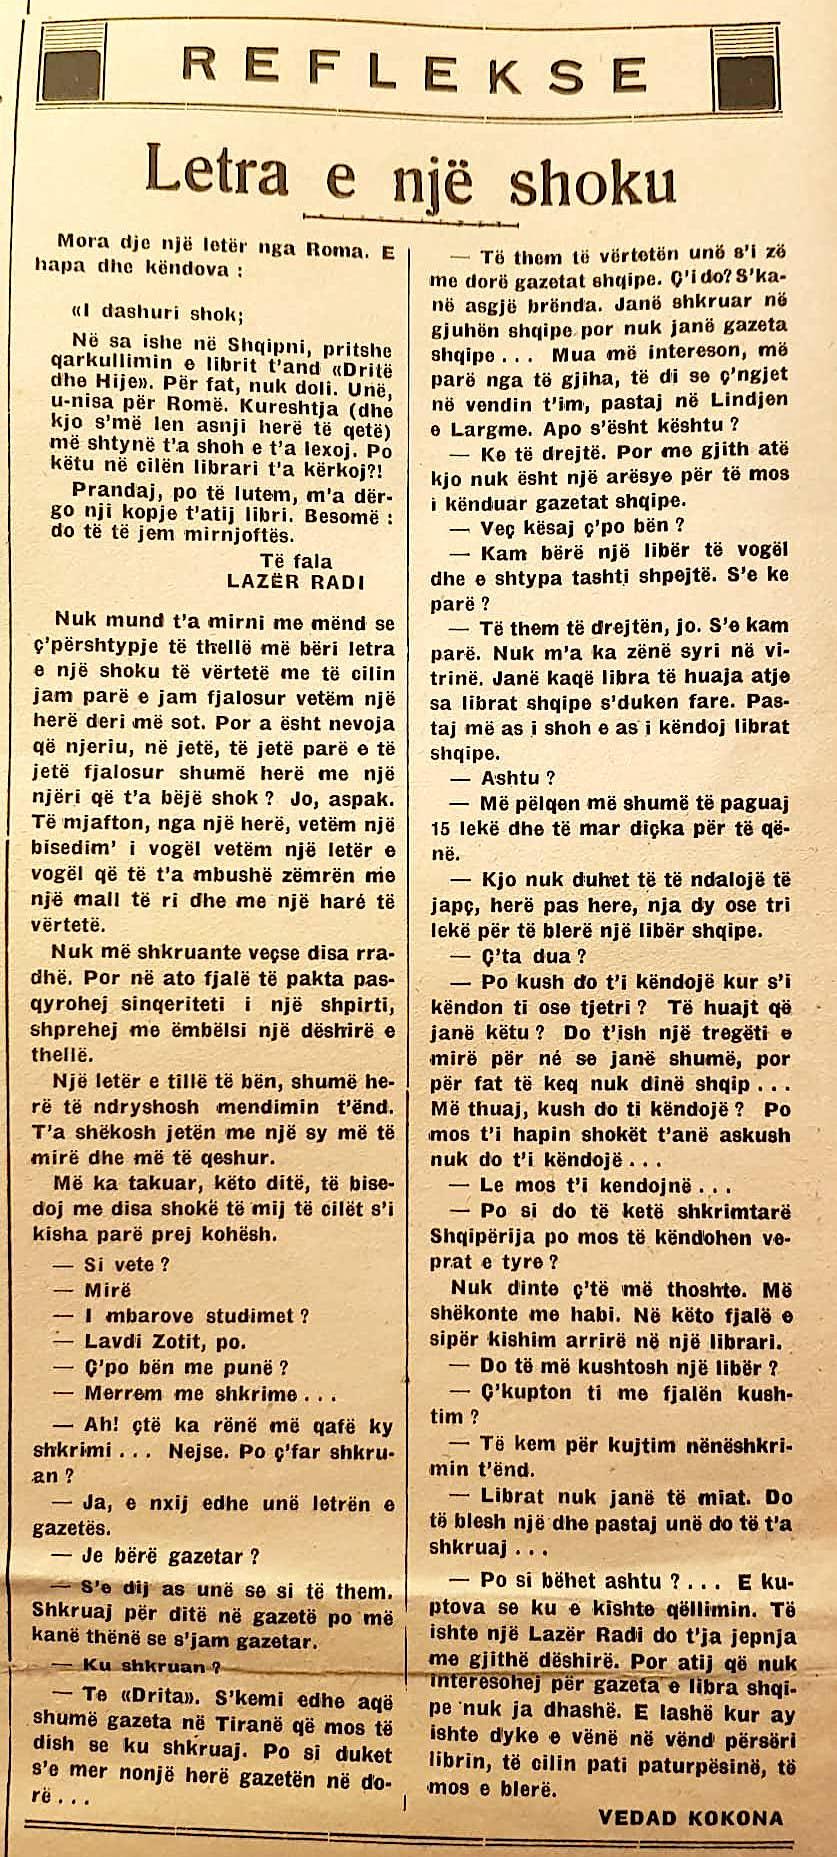 Vedat Kokona - Leter e nje shoku (1939)